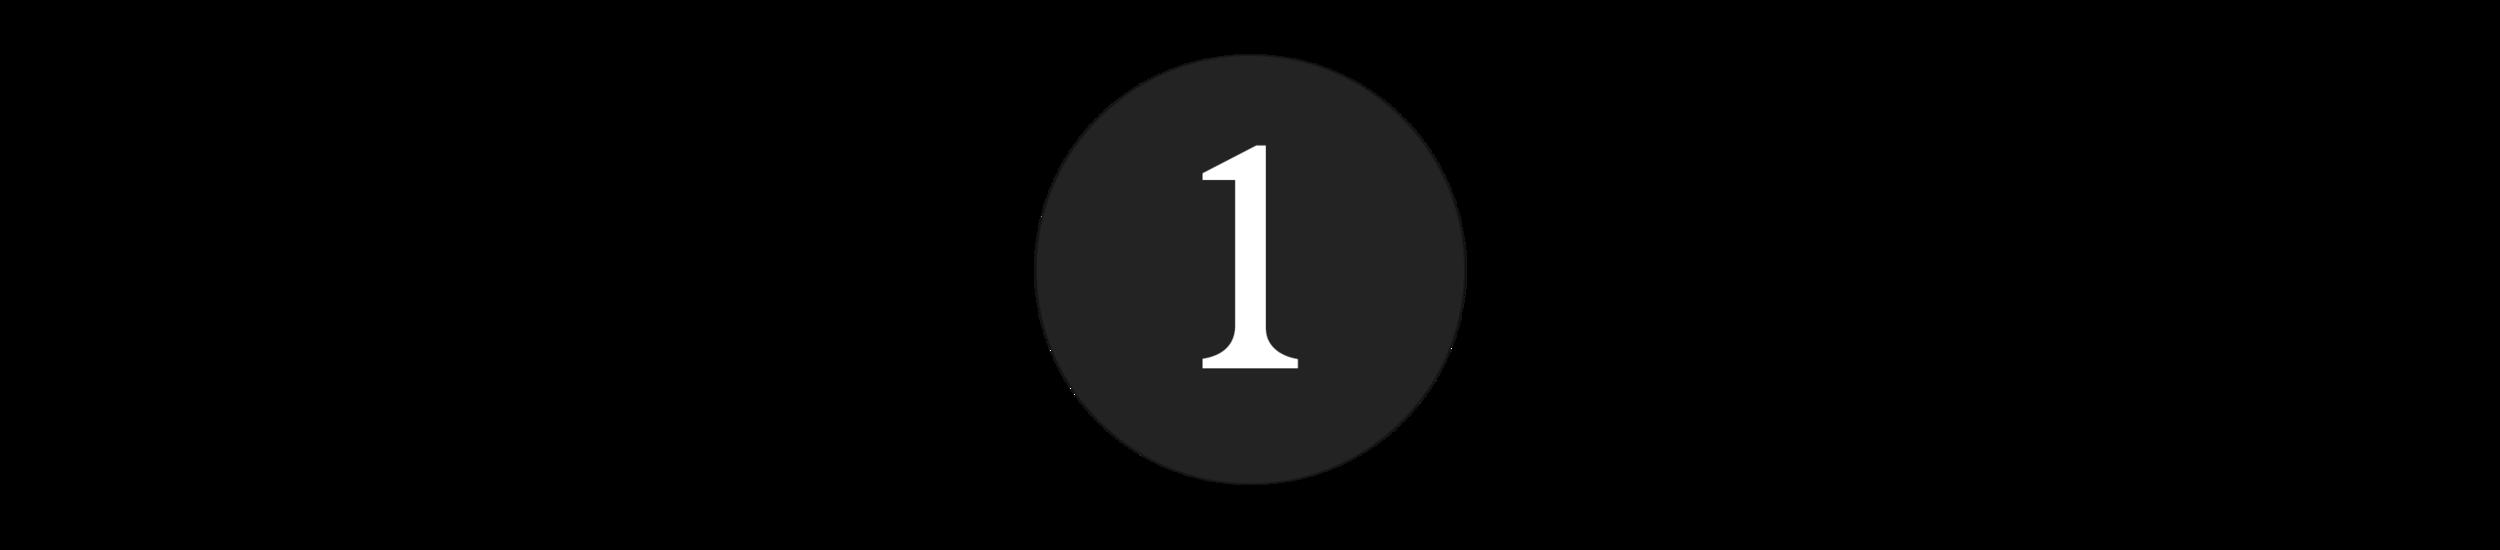 1.png